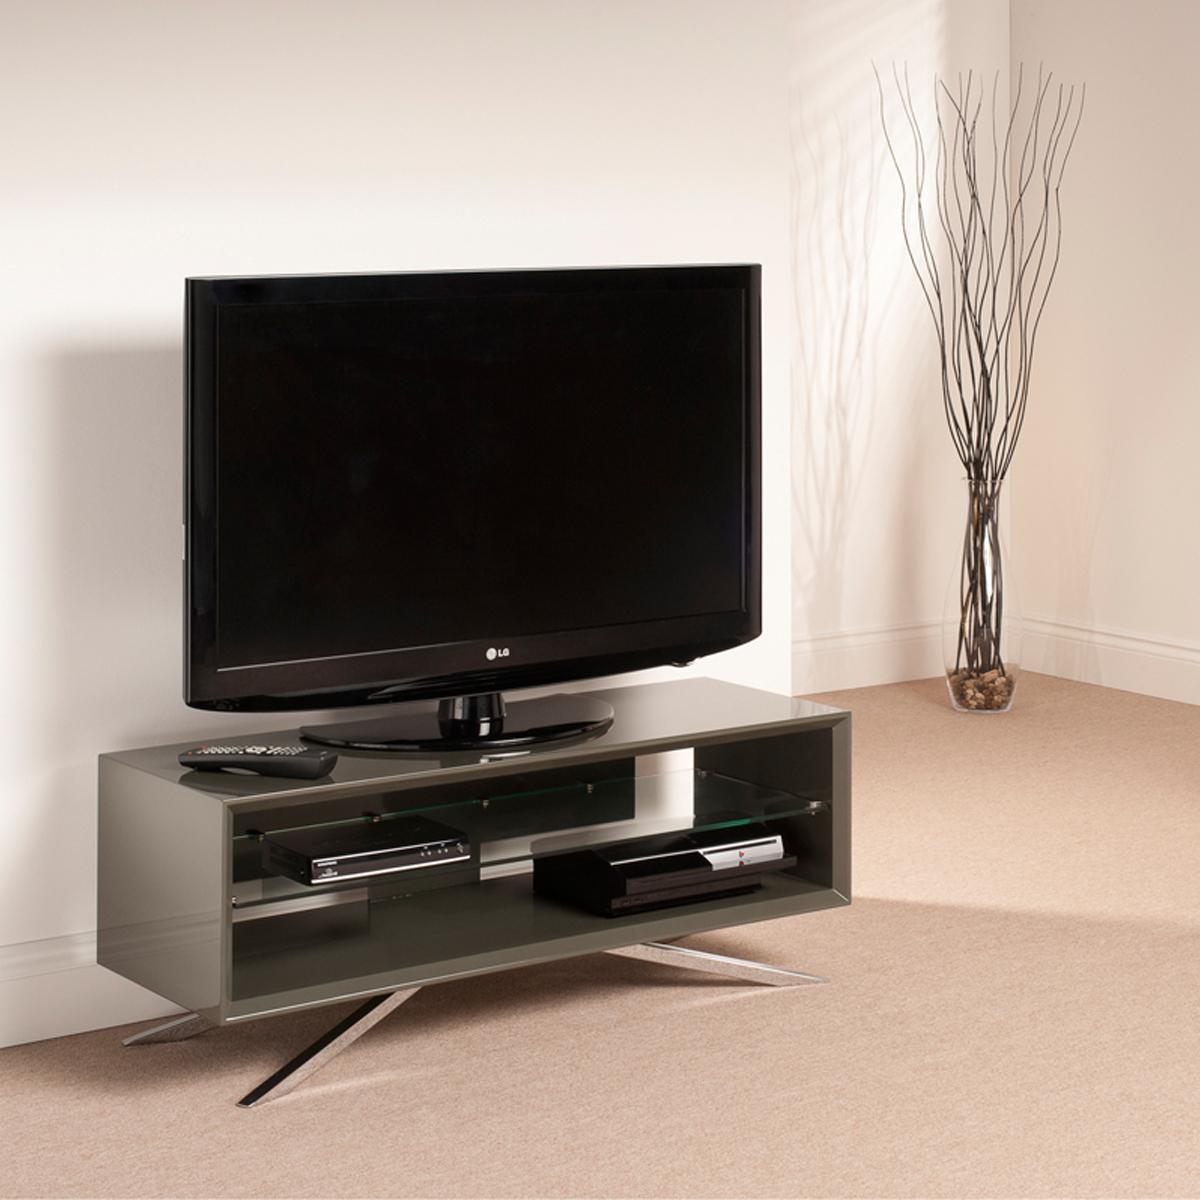 Grey Low Level Clear Glass Shelf Lcd Plasma Tv Stand 42